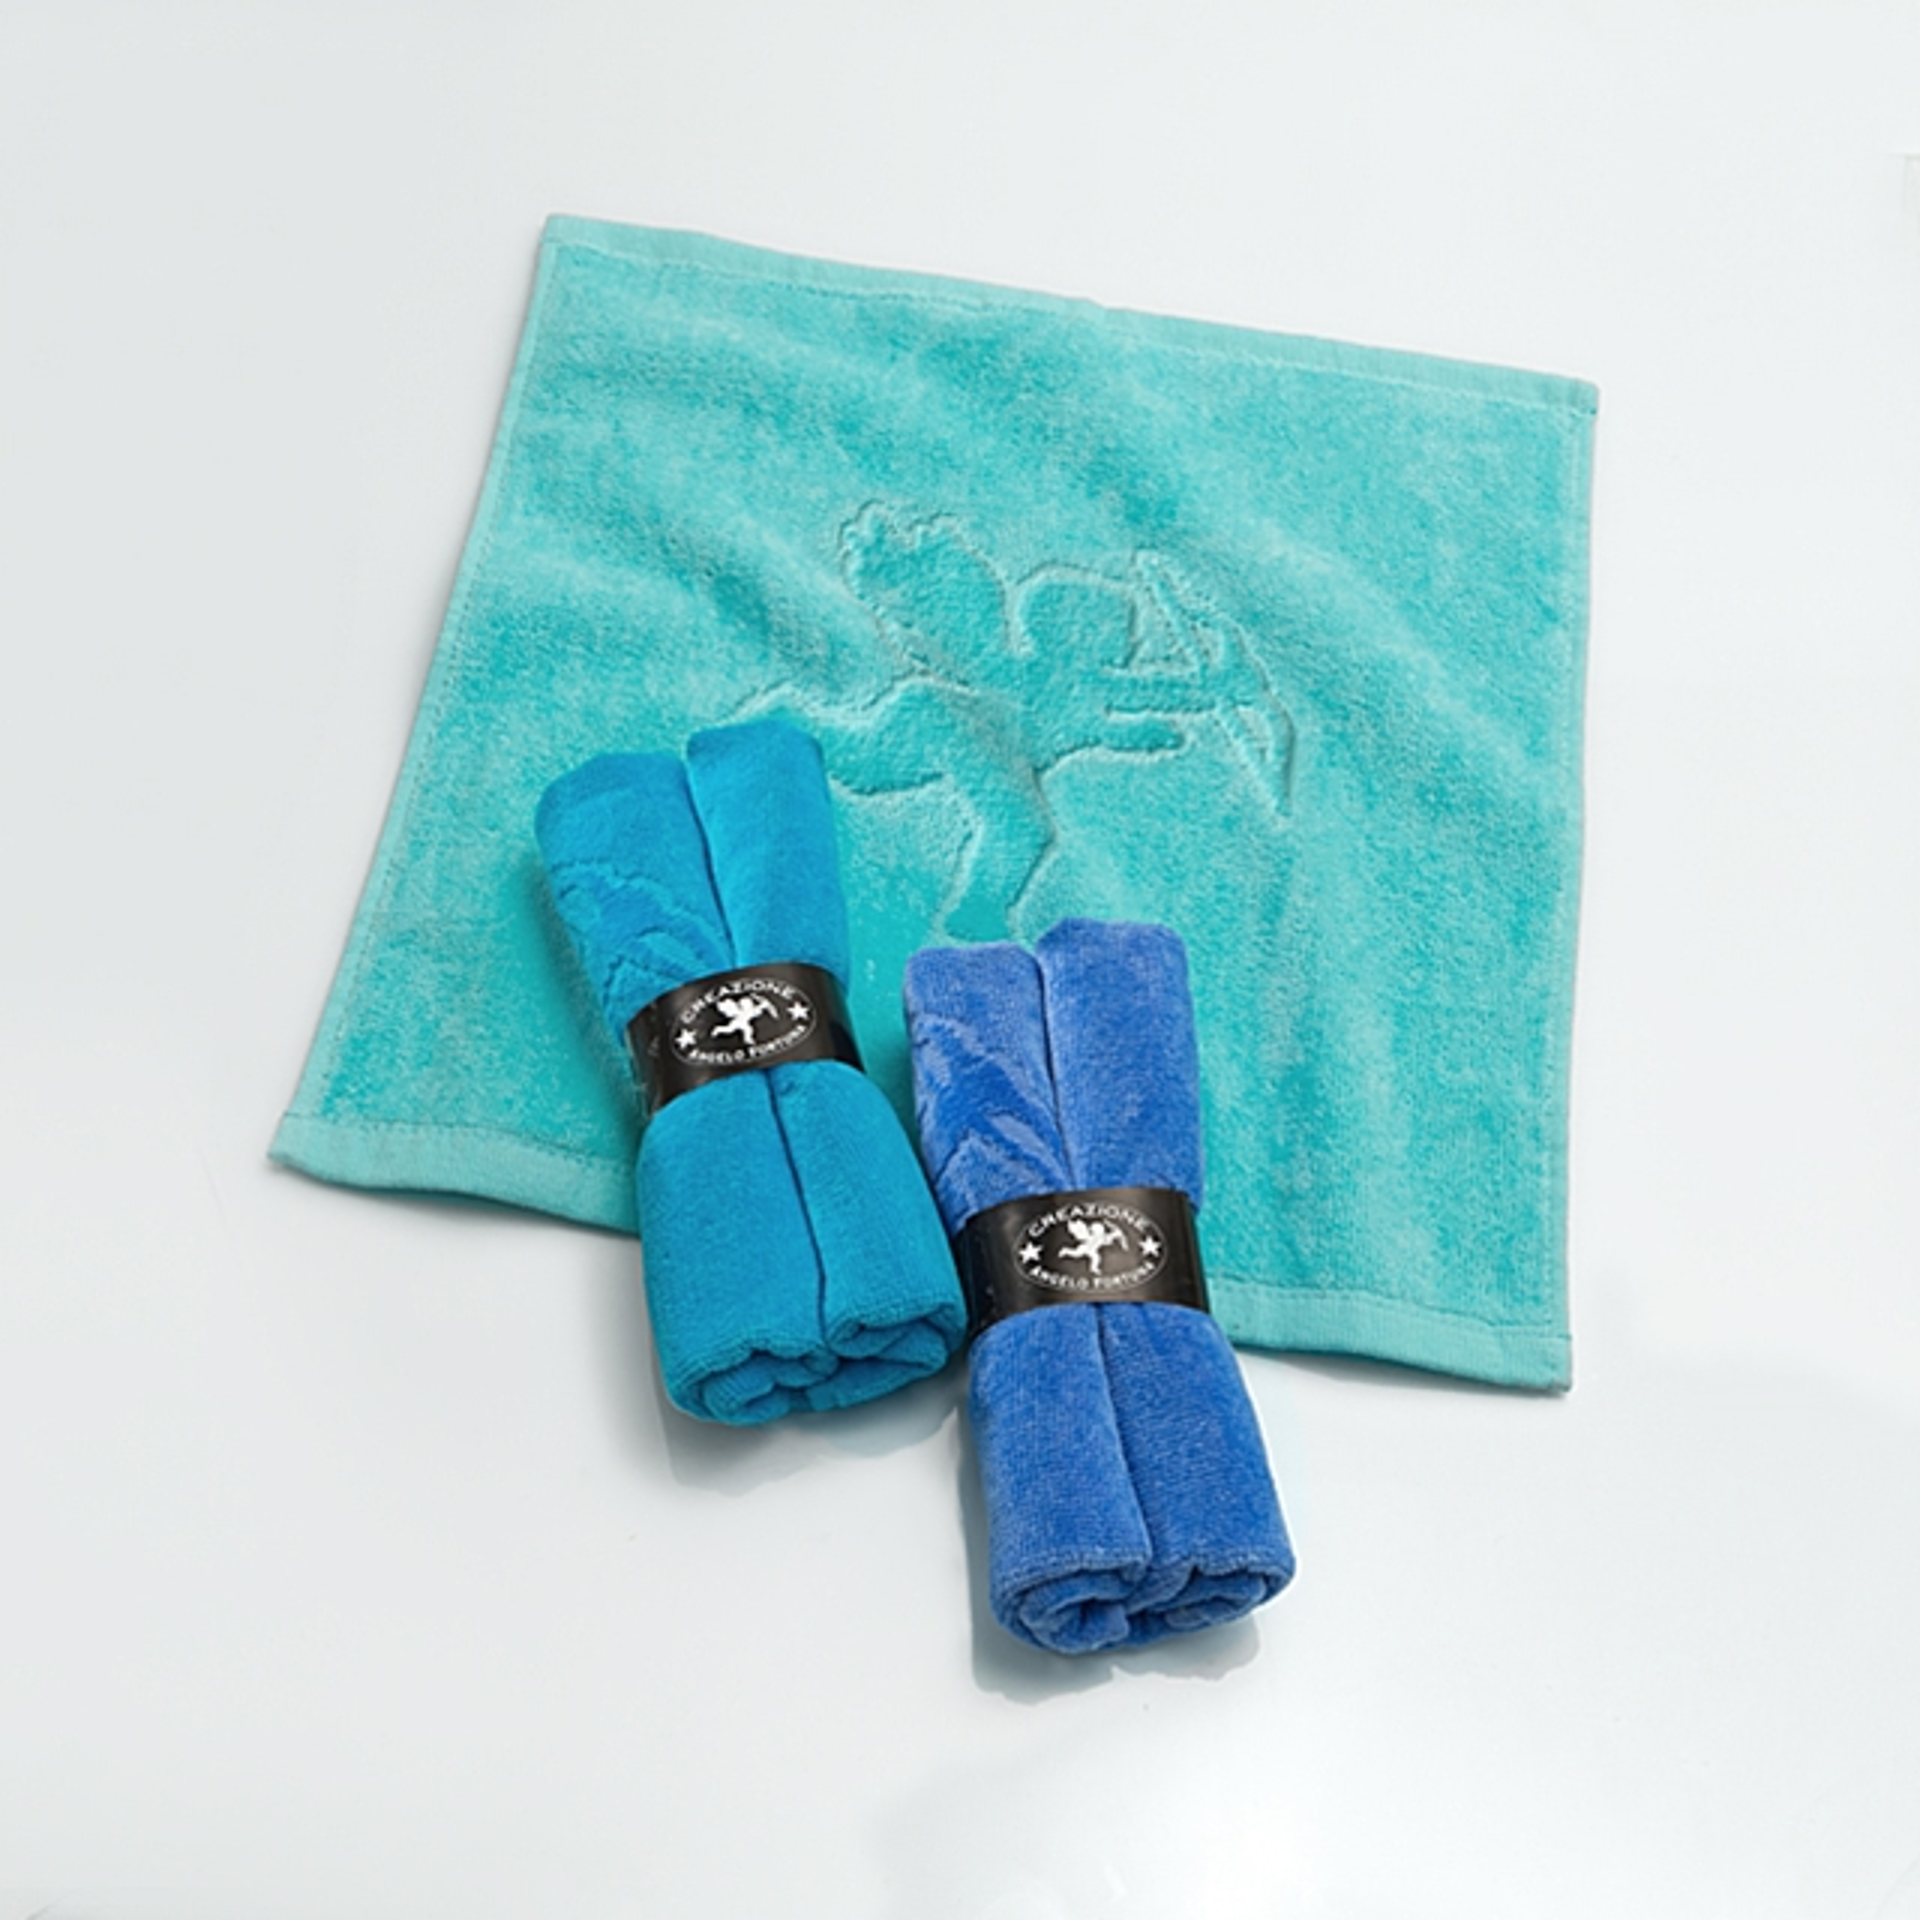 Waschlappen 3 Stk. Ocean Blue